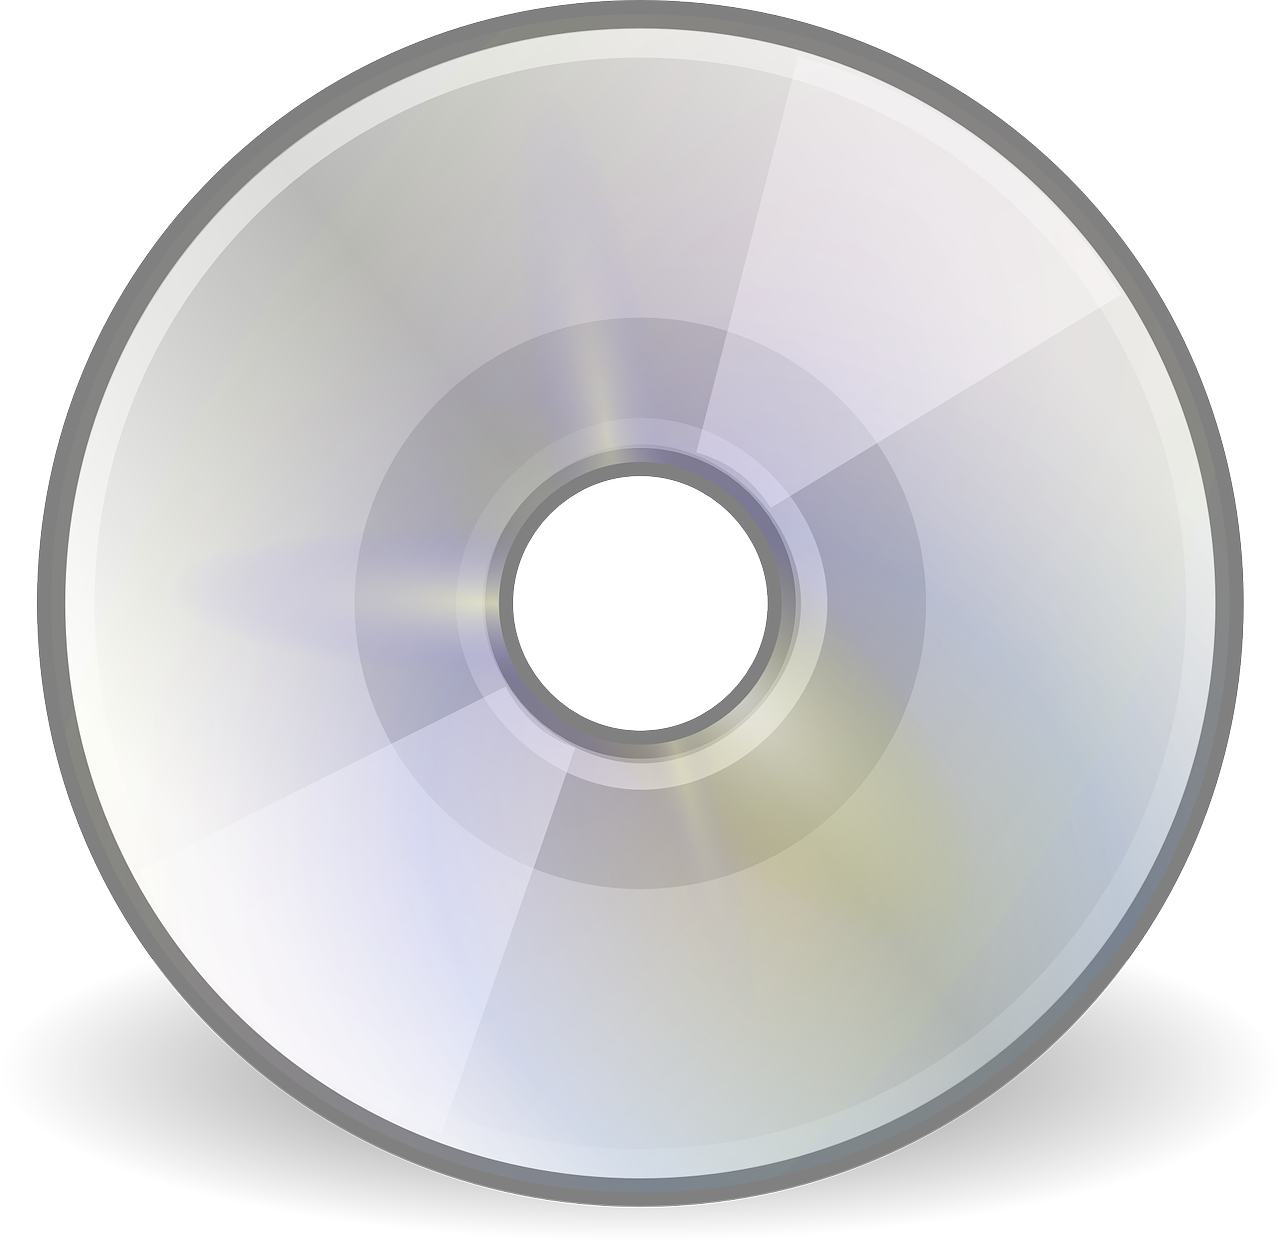 общественности картинка на диск формат вид визитки стилистически